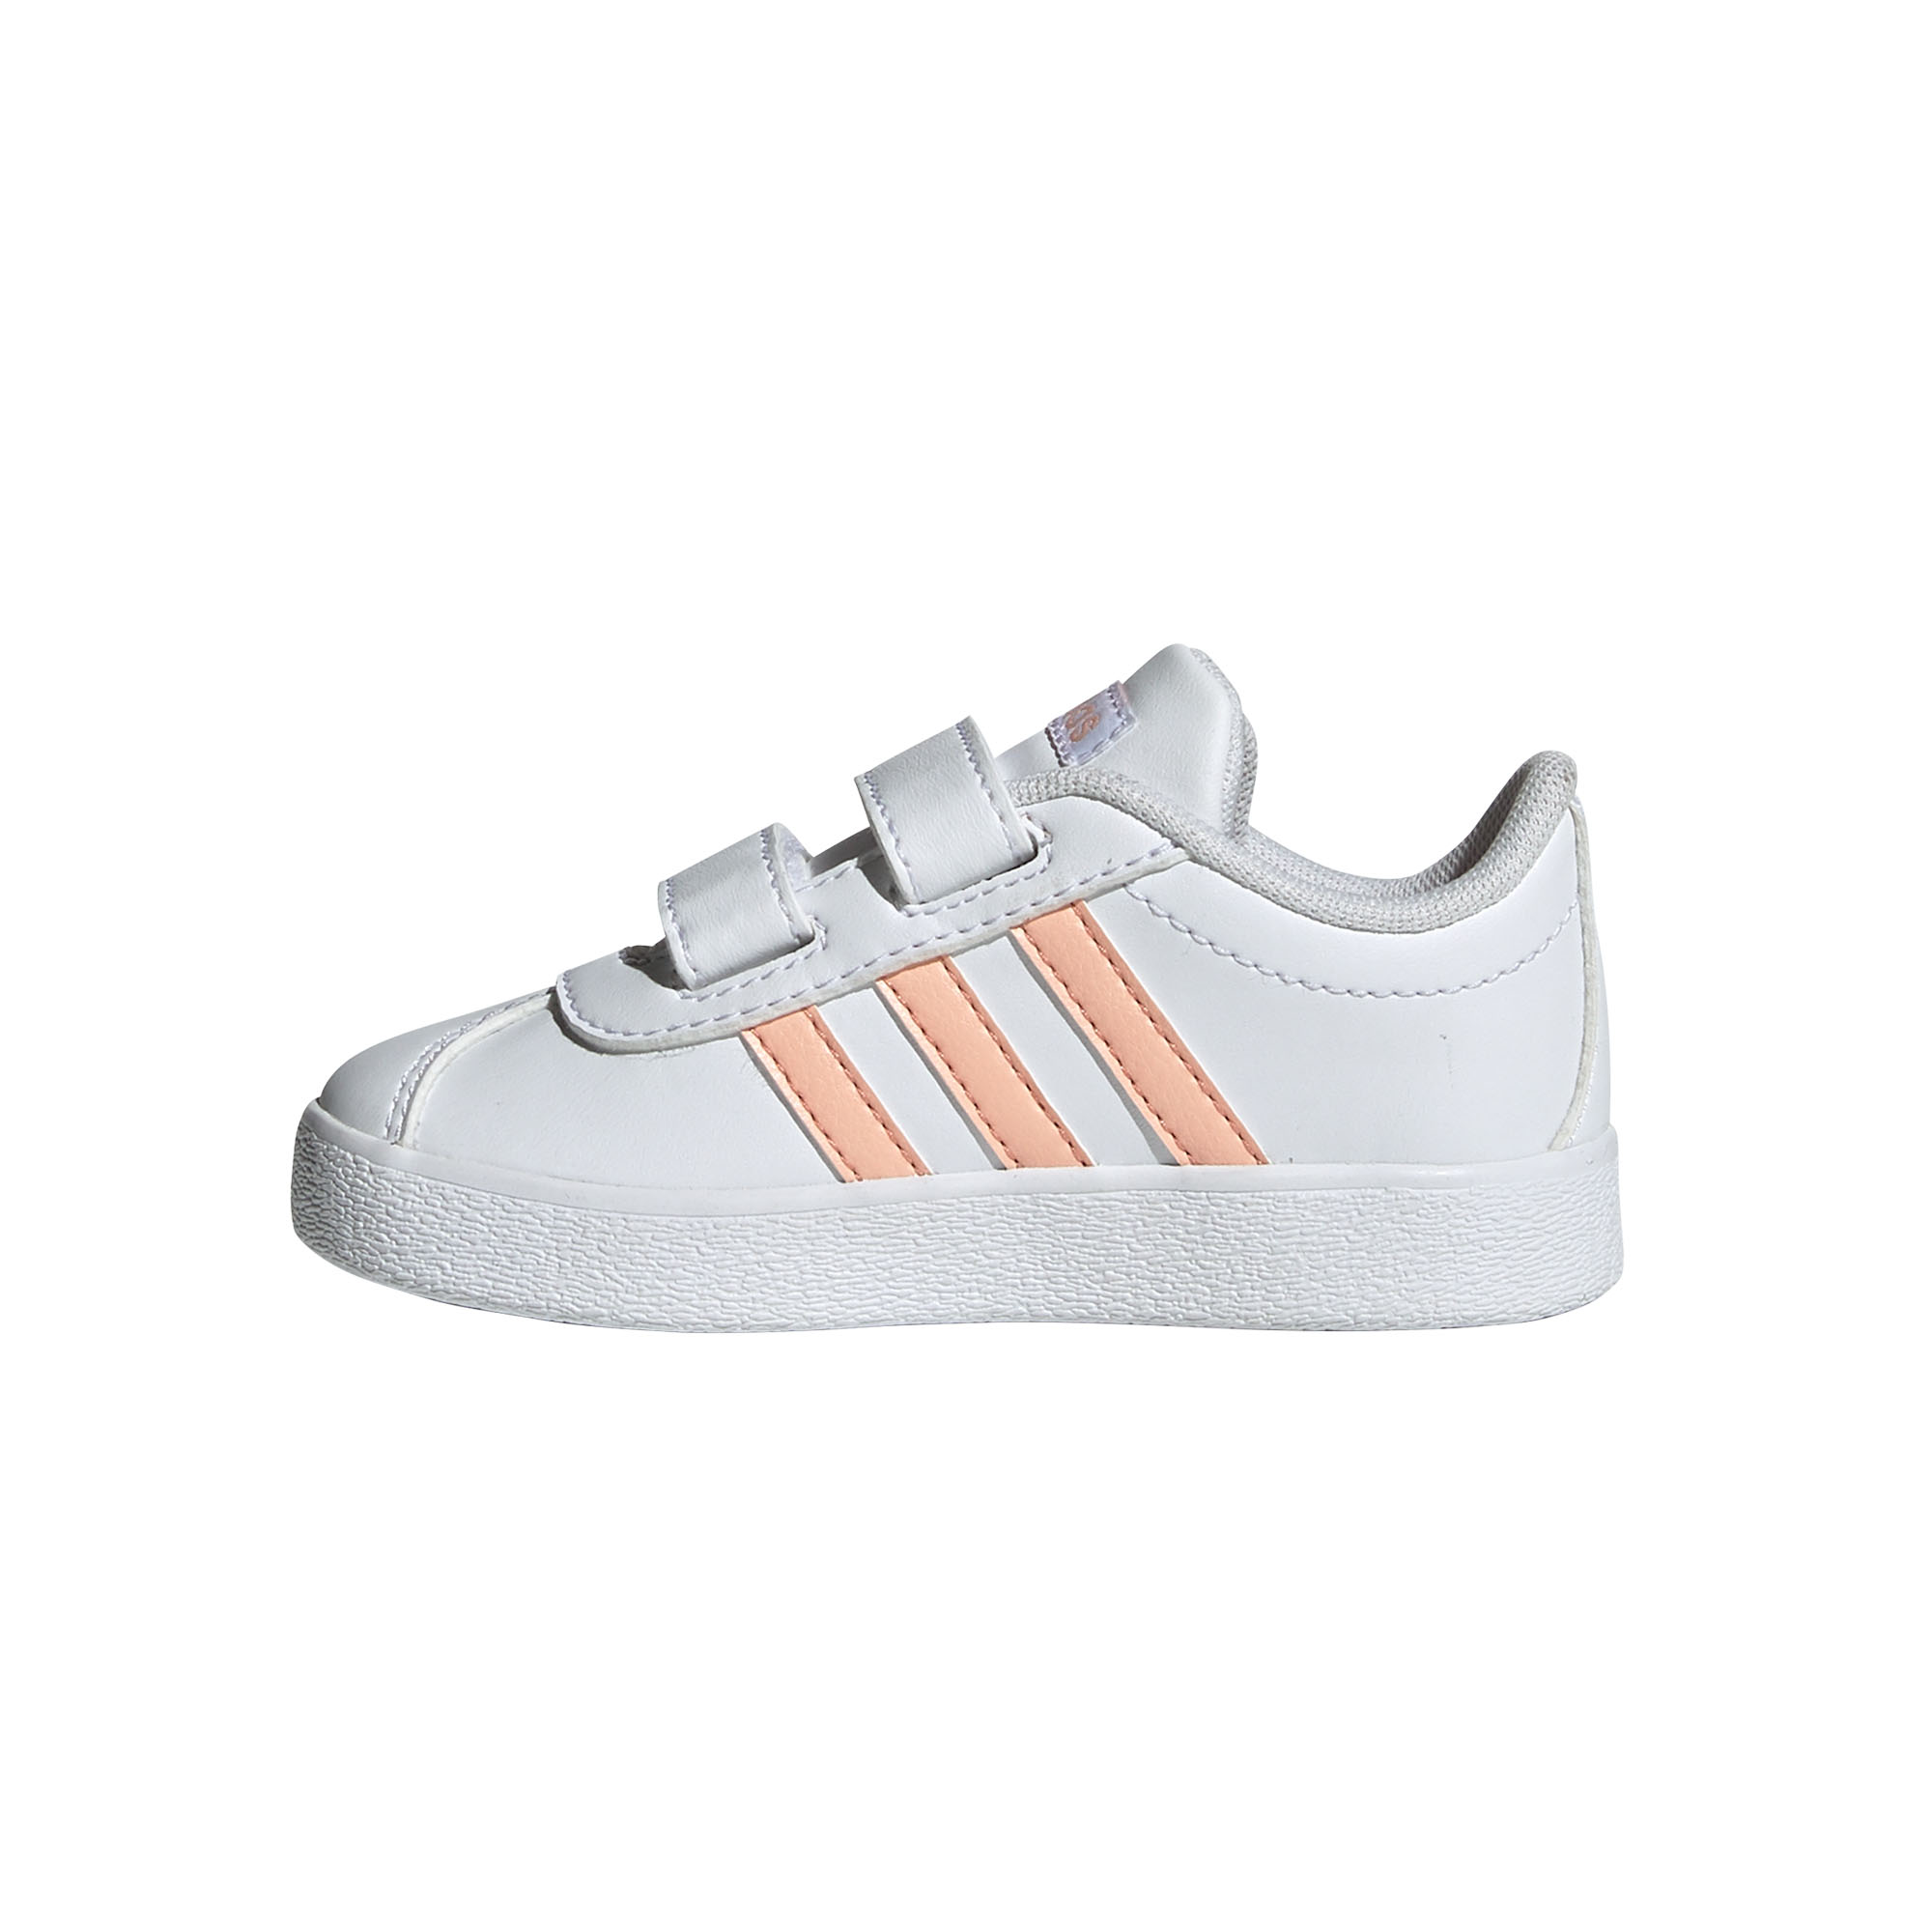 adidas VL Court 2.0 Infant Kids Boys Sports Trainer Shoe Black